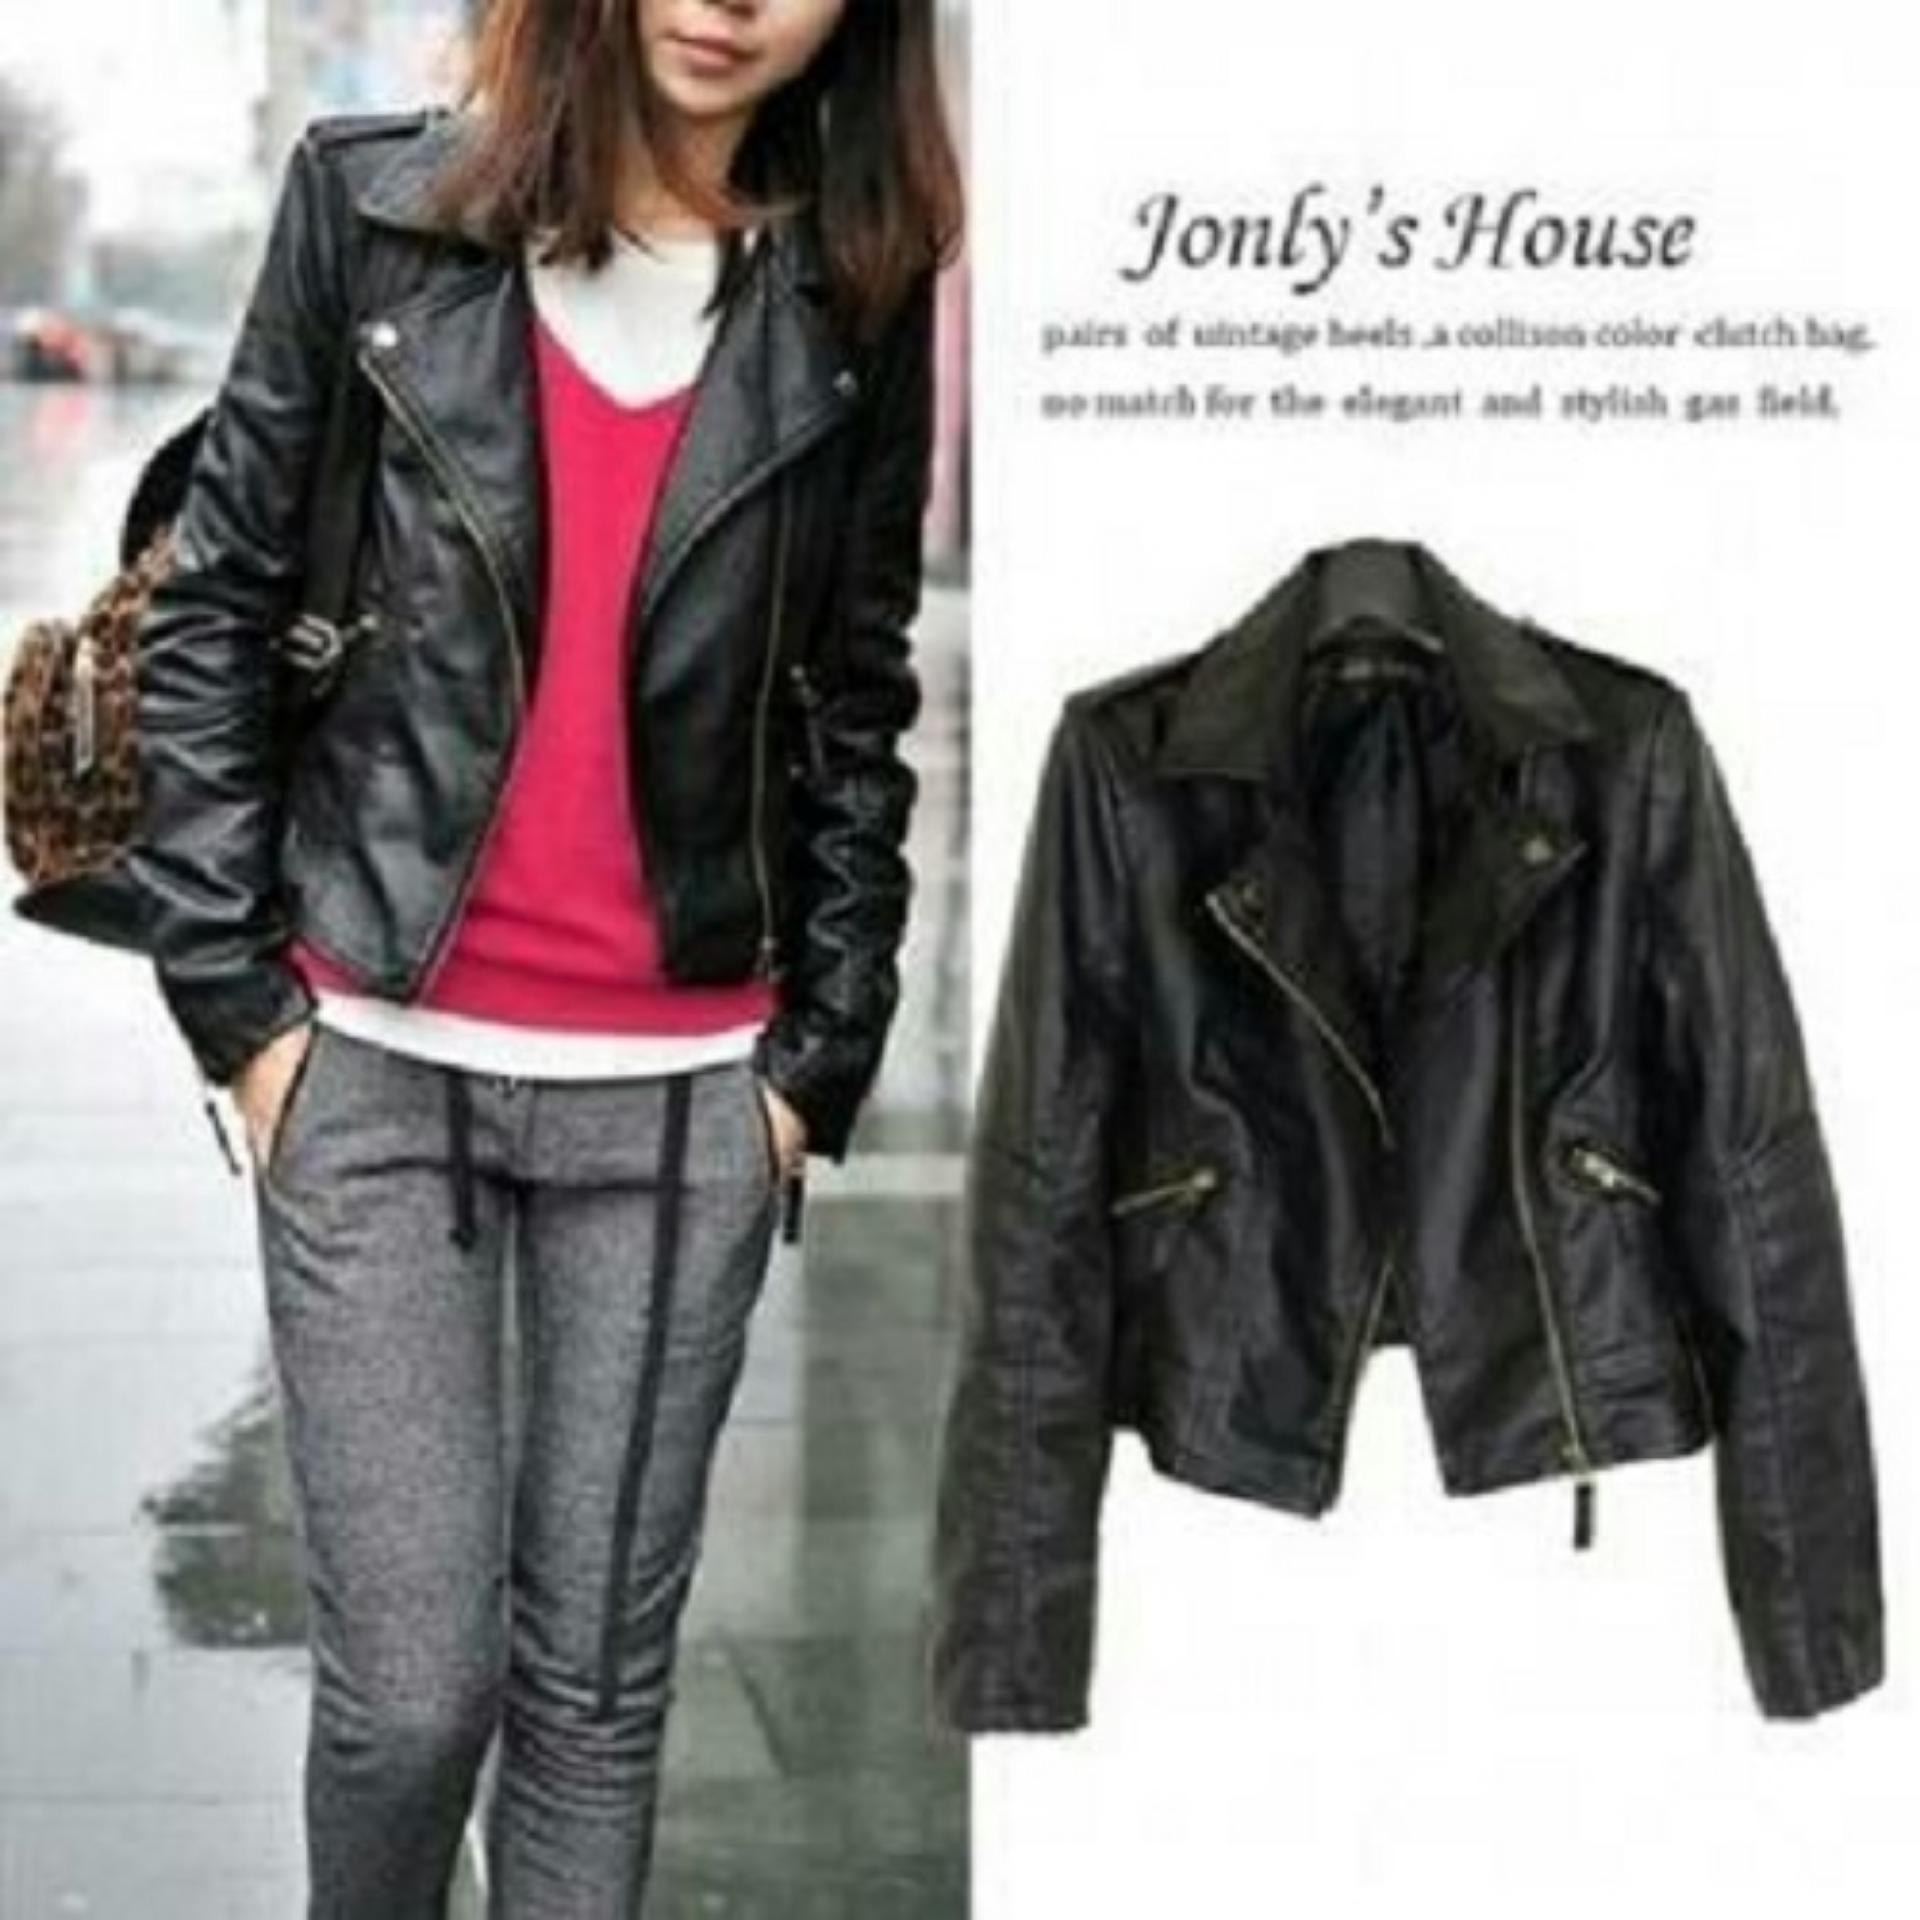 Buy Sell Cheapest Klikfashions Jaket Kulit Best Quality Product Pria David Black Trendshopee Pakaian Wanita Jonfy